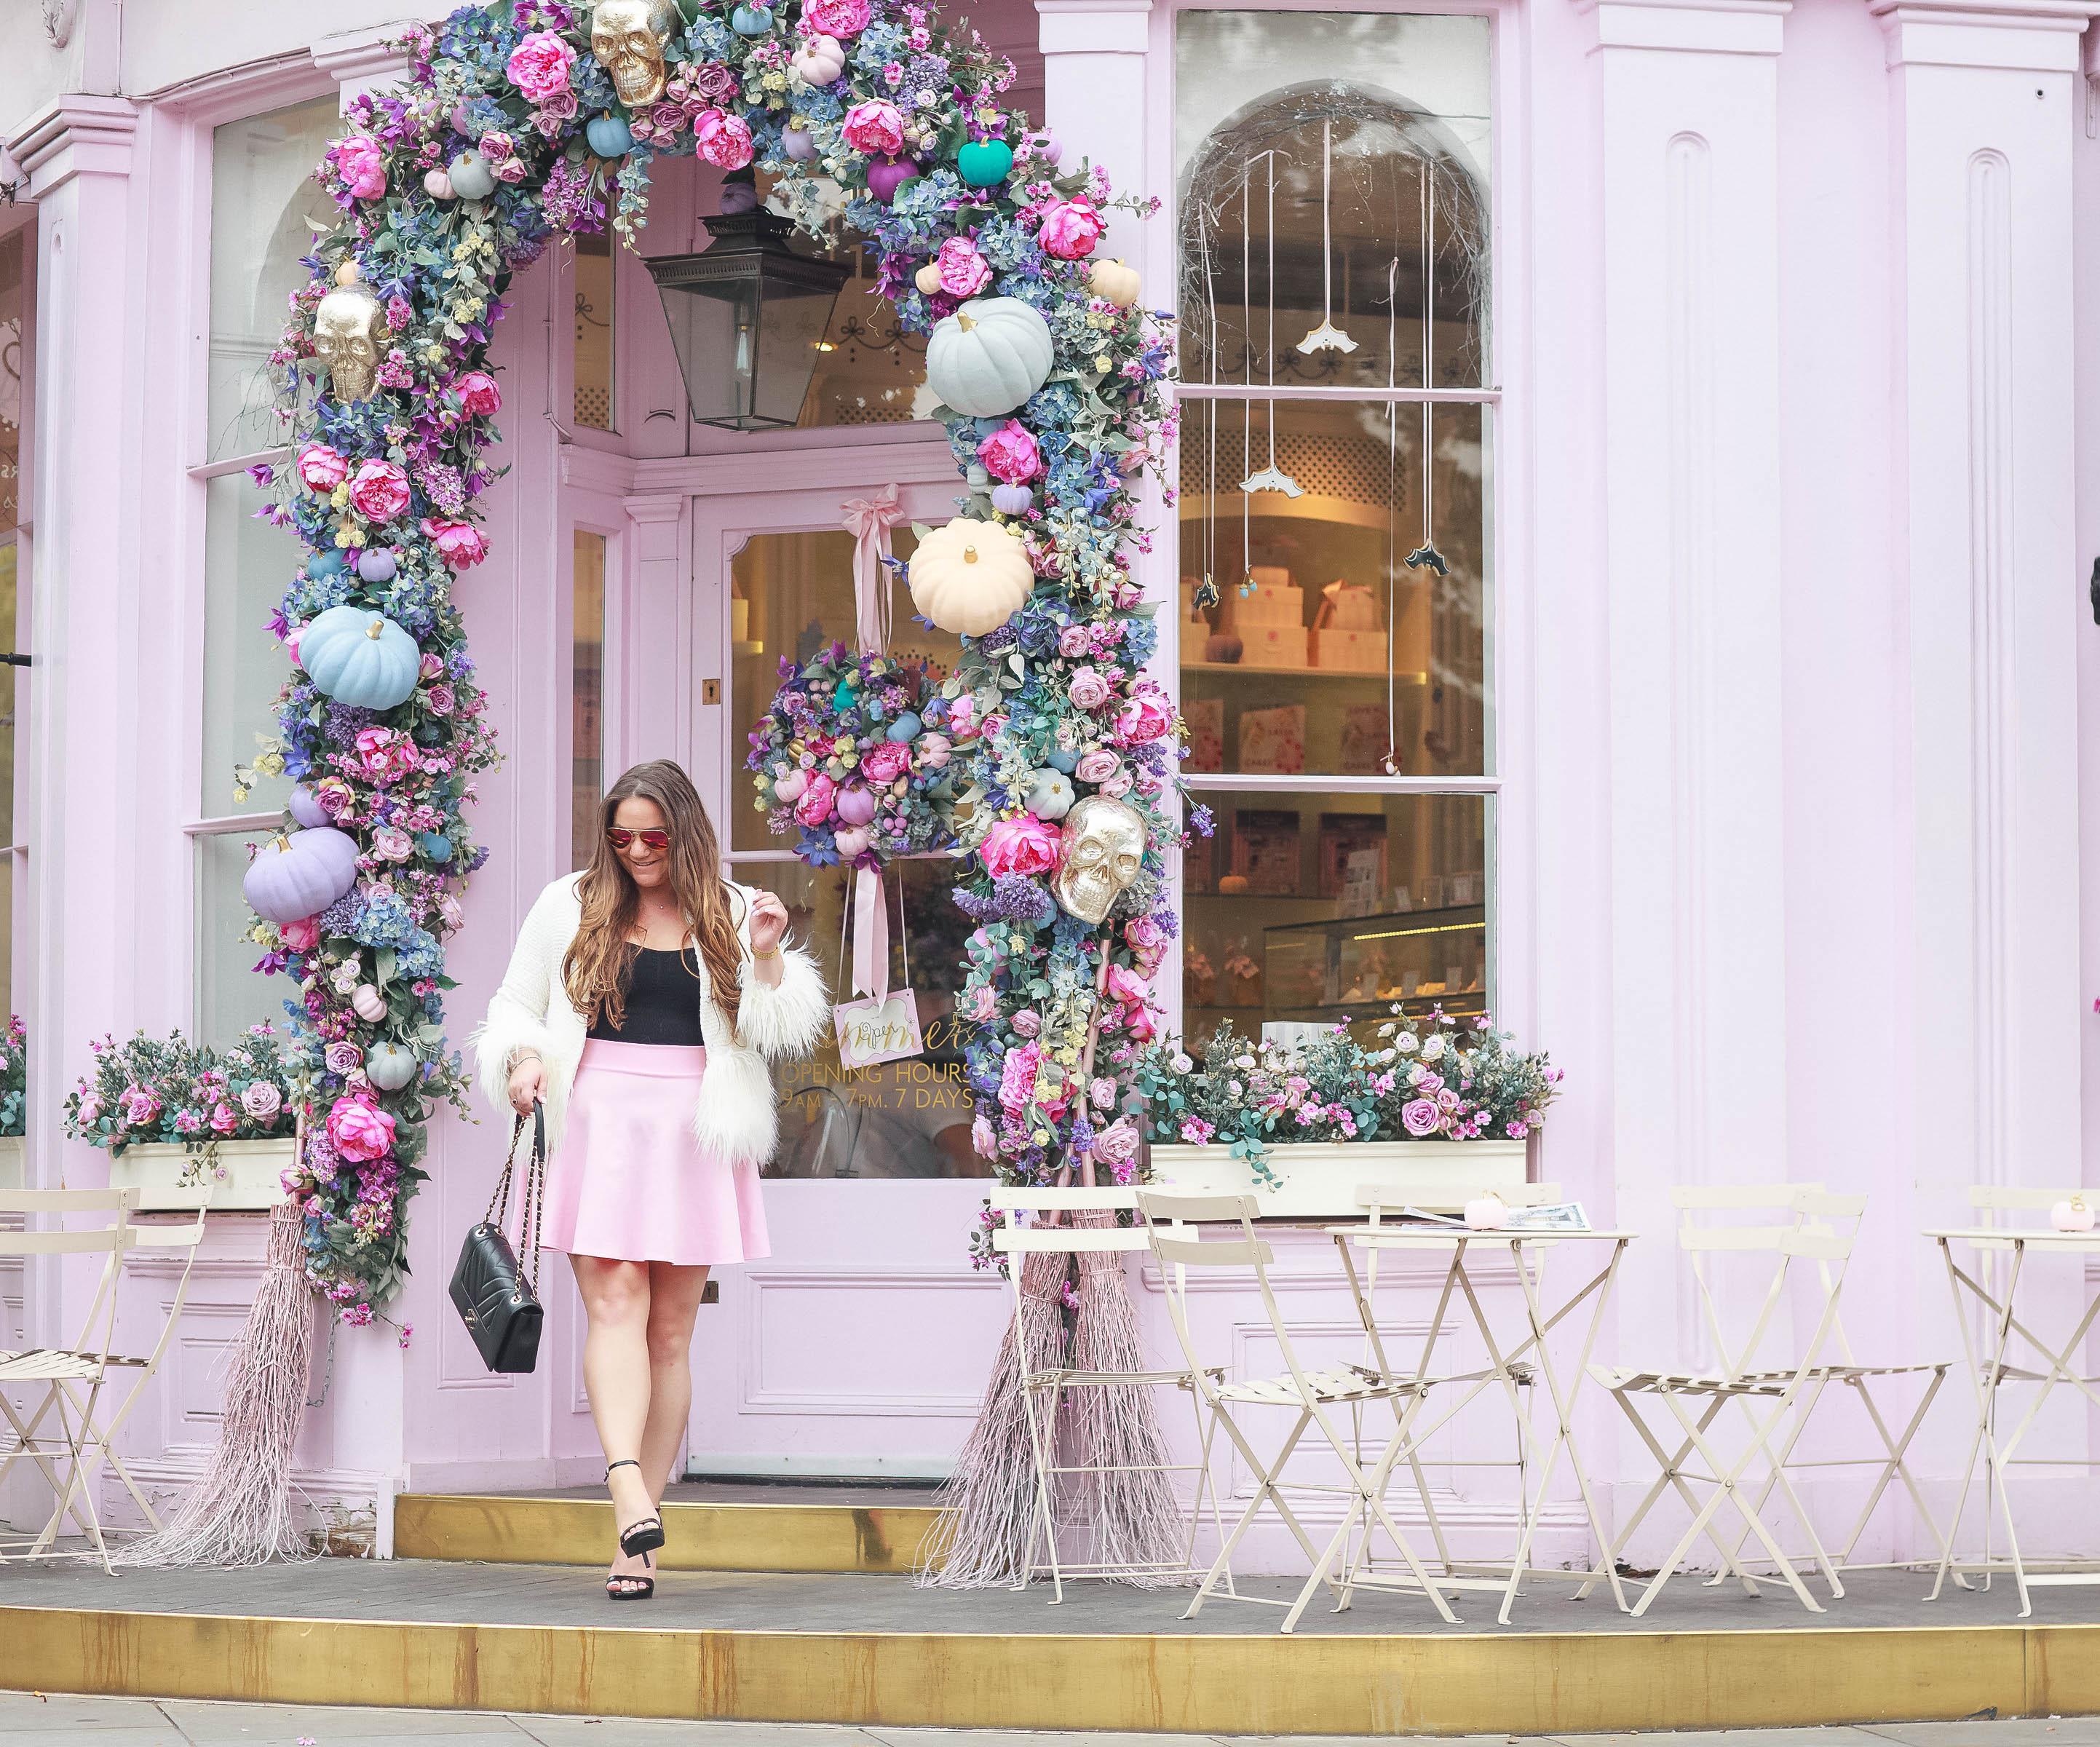 missyonmadison, missyonmadison blog, missyonmadison instagram, fashion blog, fashion blogger, style blog, style blogger, ootd, peggy porschen, london visit, london sightseeing, london cafe, peggy porschen london, peggy porschen cakes, places to visit in london, instagram places london, pink skater skirt, pink scuba skirt, black body suit, pink raybans, black ankle strap heels, steve madden black ankle strap heels, chanel bag, chanel flap bag, shein, shein tweed coat, white faux fur coat, white tweed coat with faux fur trim, visit london, la blogger, winter style, fall style,